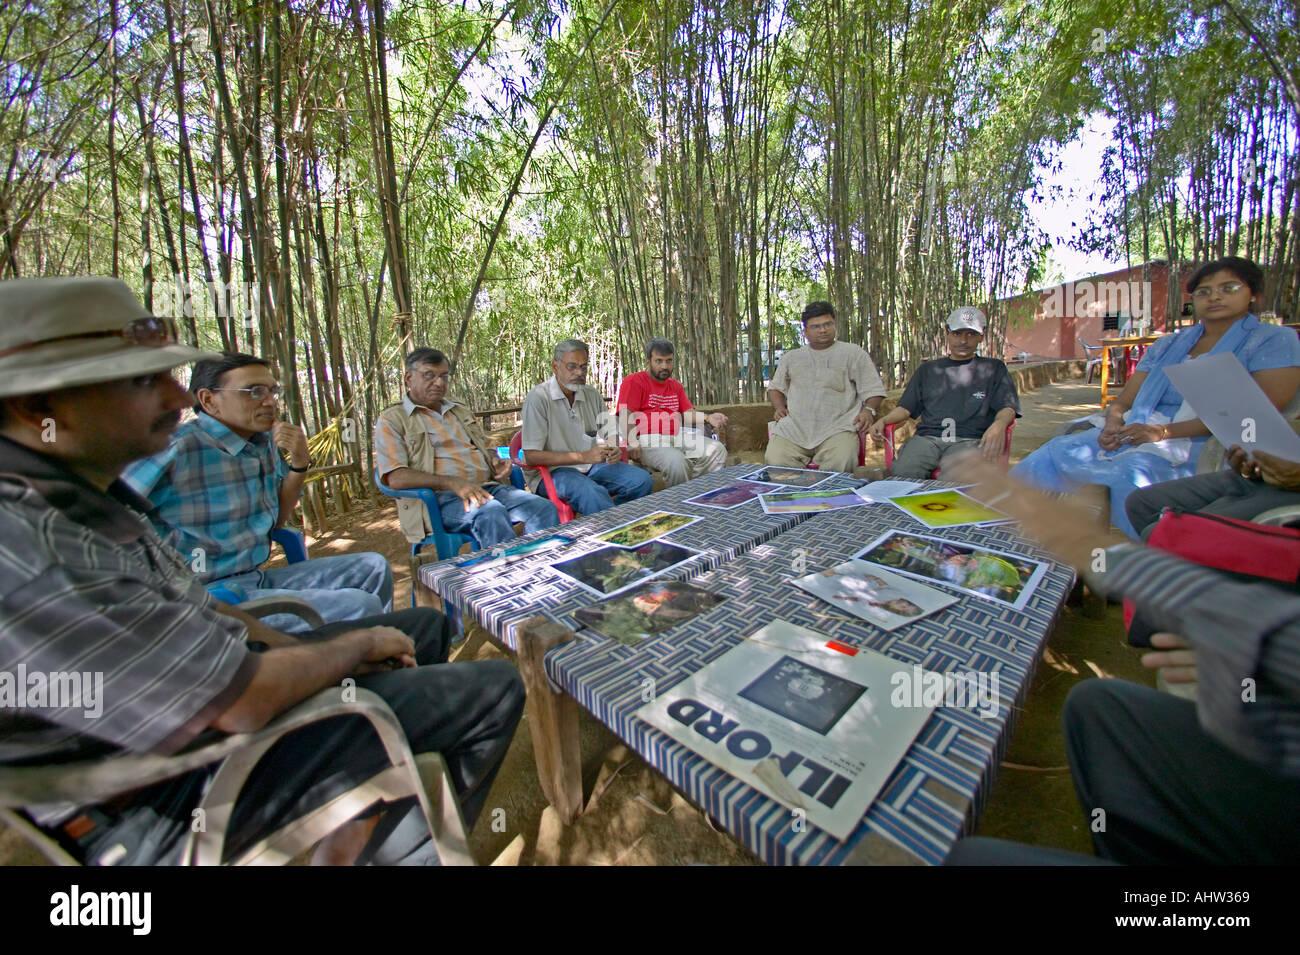 AAD 91600 Photography Creative WorkShop Dinodia photographers discussing art Neral Maharashtra INDIA Stock Photo